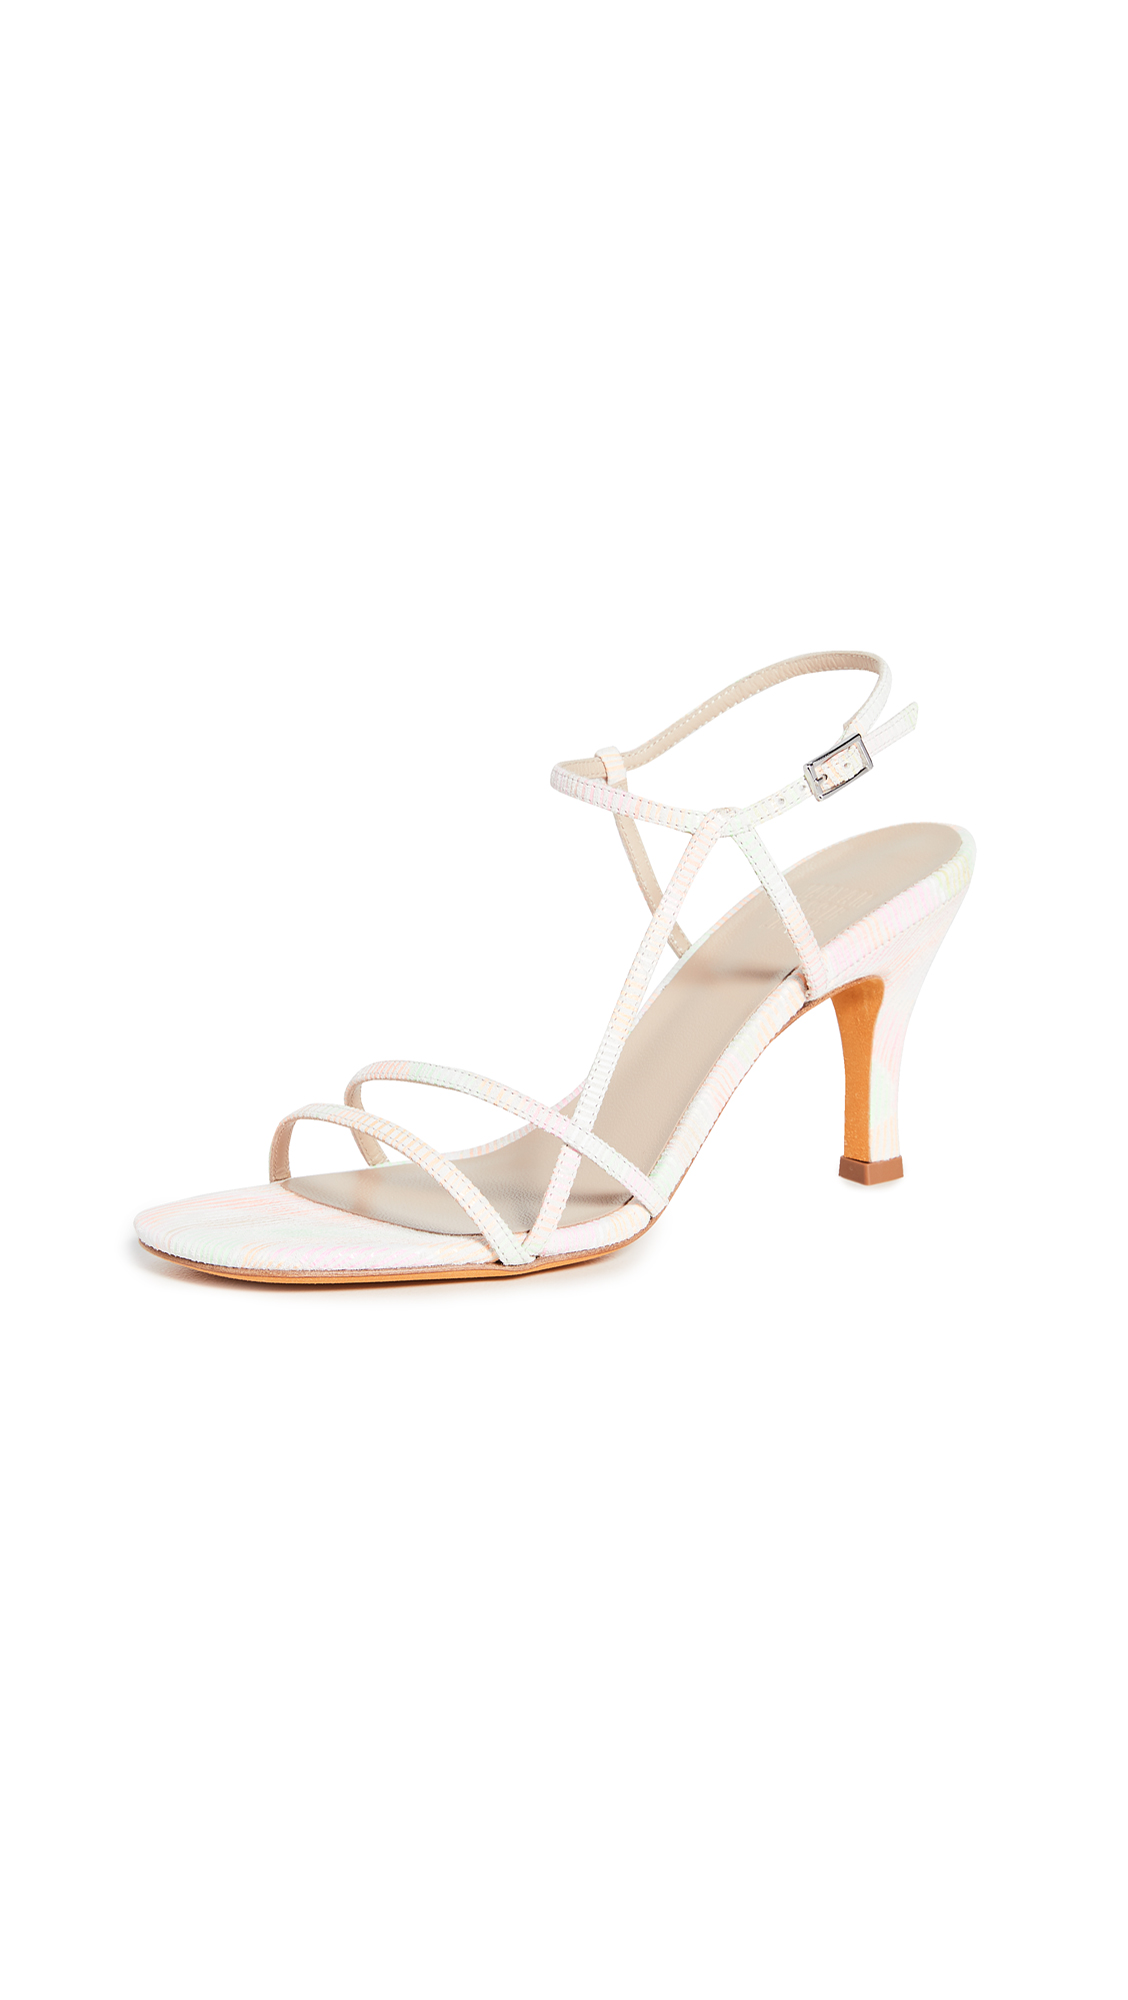 Buy Maryam Nassir Zadeh Irene Sandals online, shop Maryam Nassir Zadeh